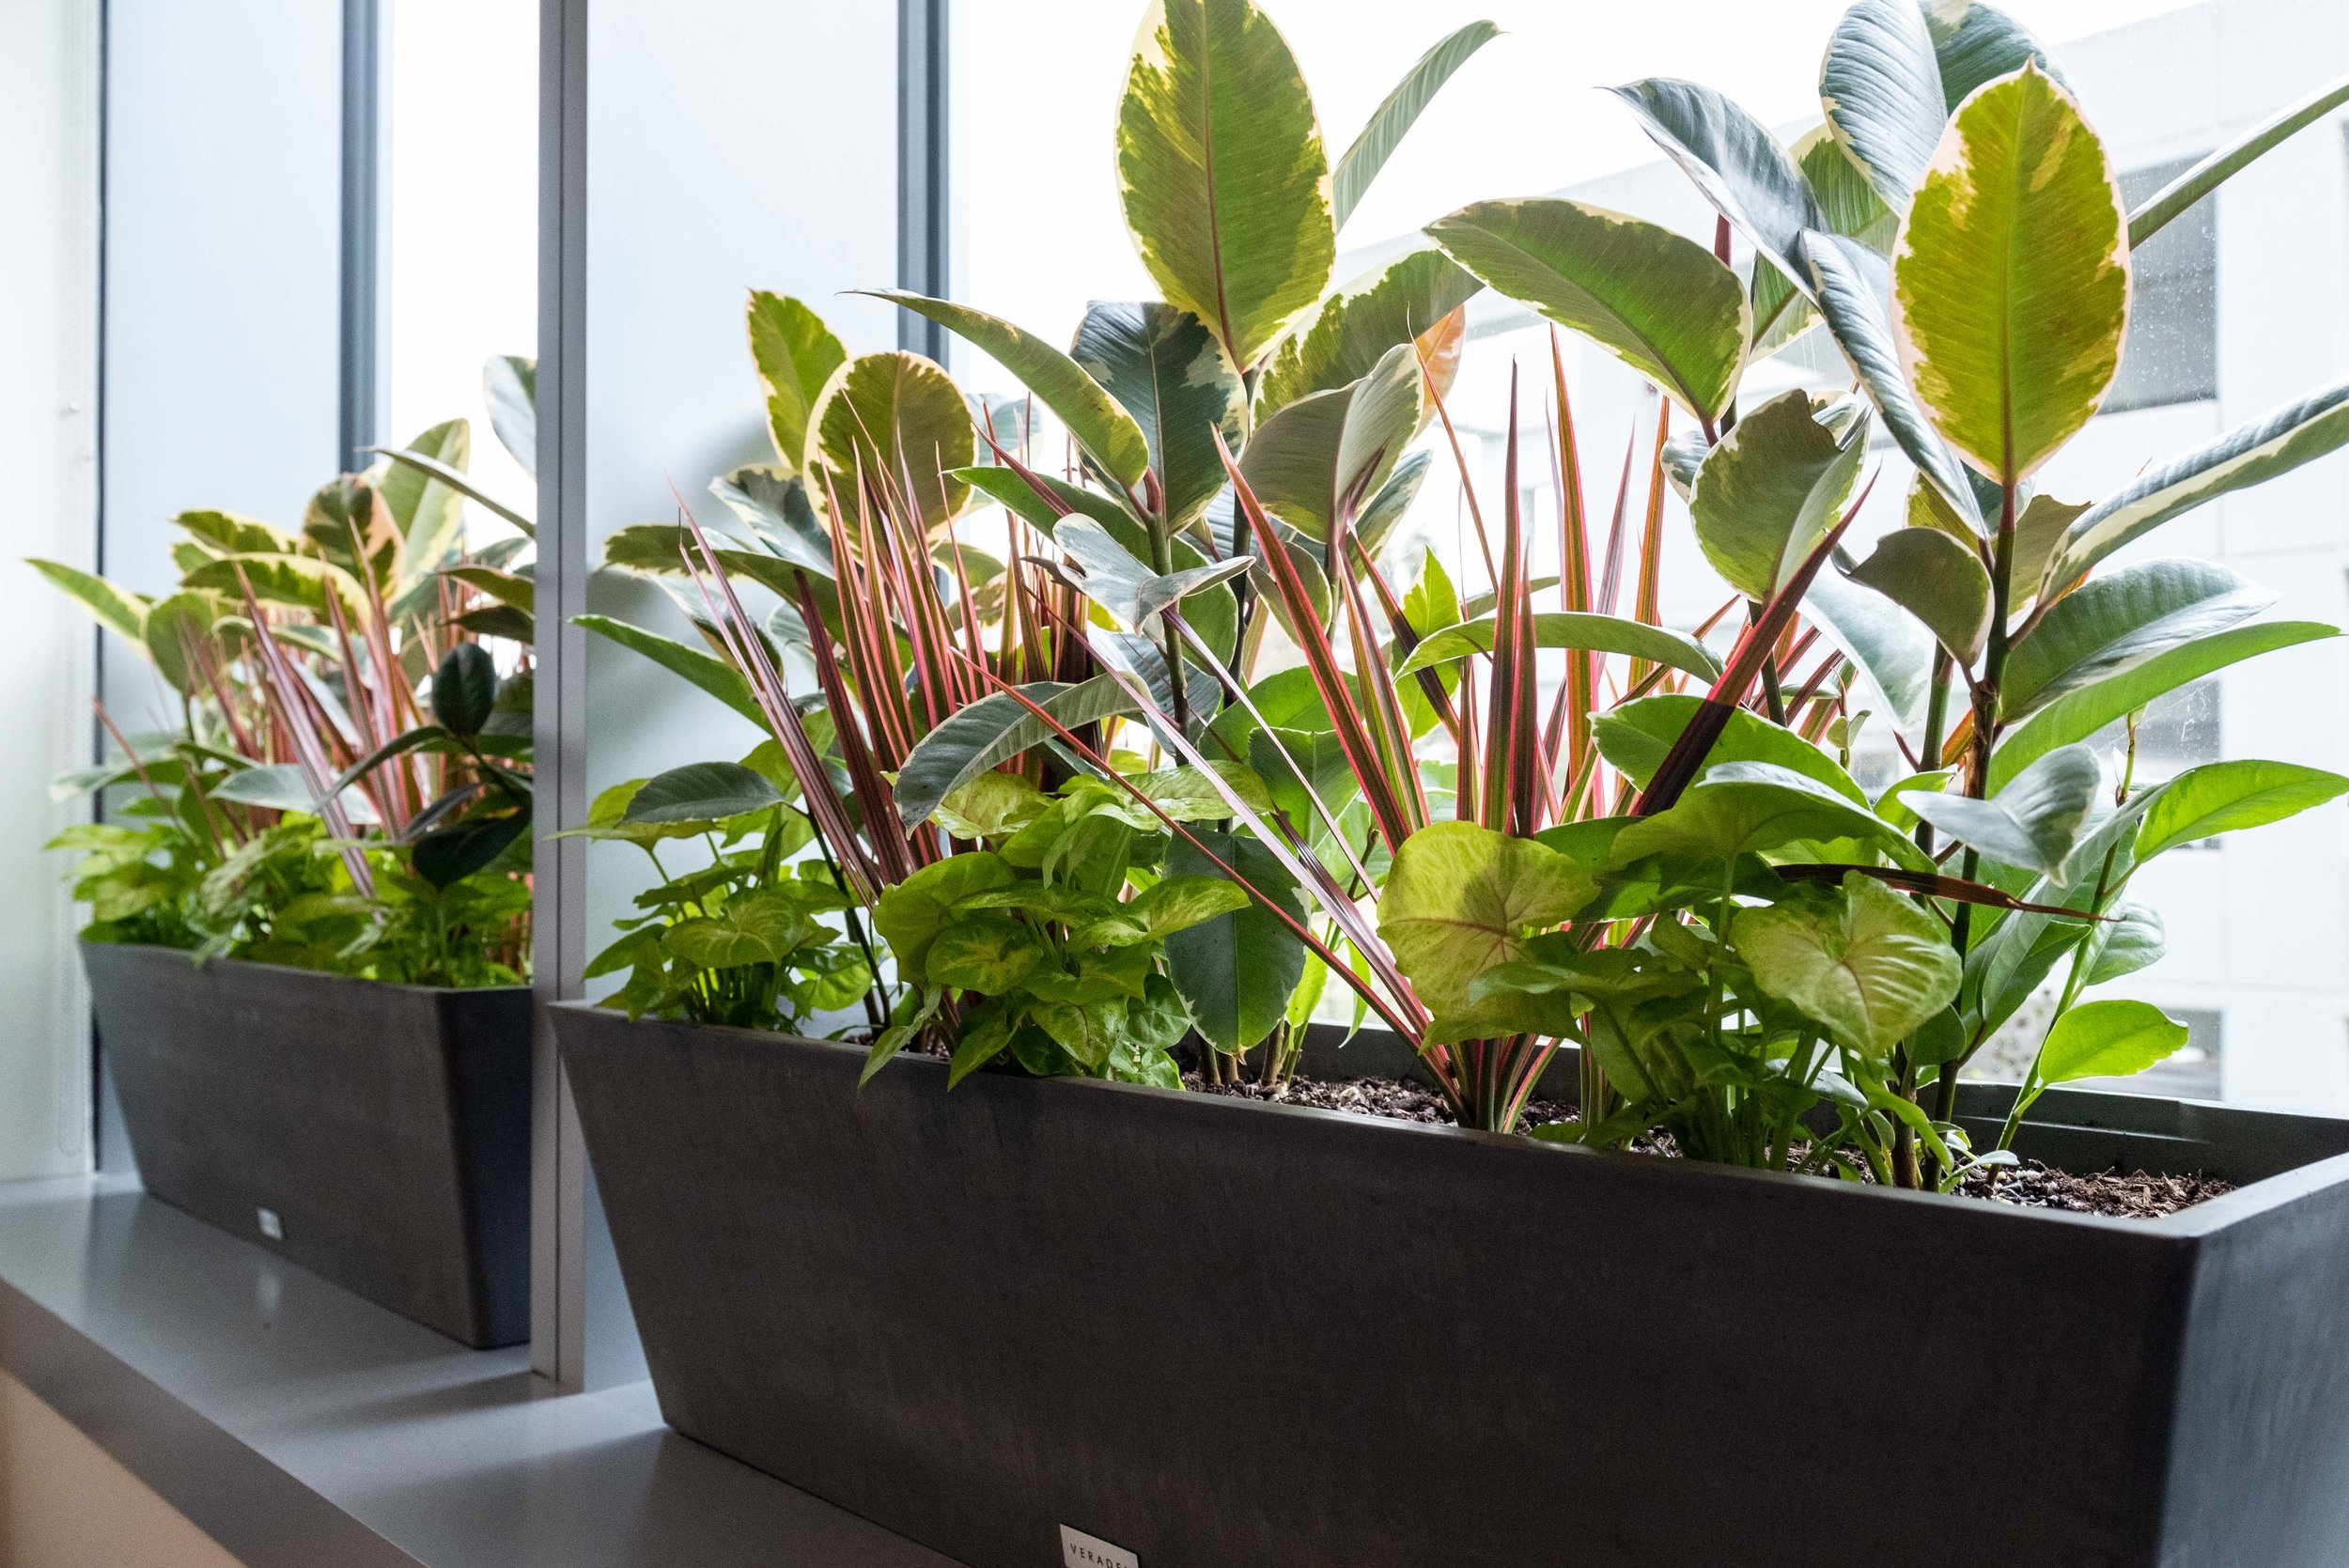 interior_plants-16.jpg